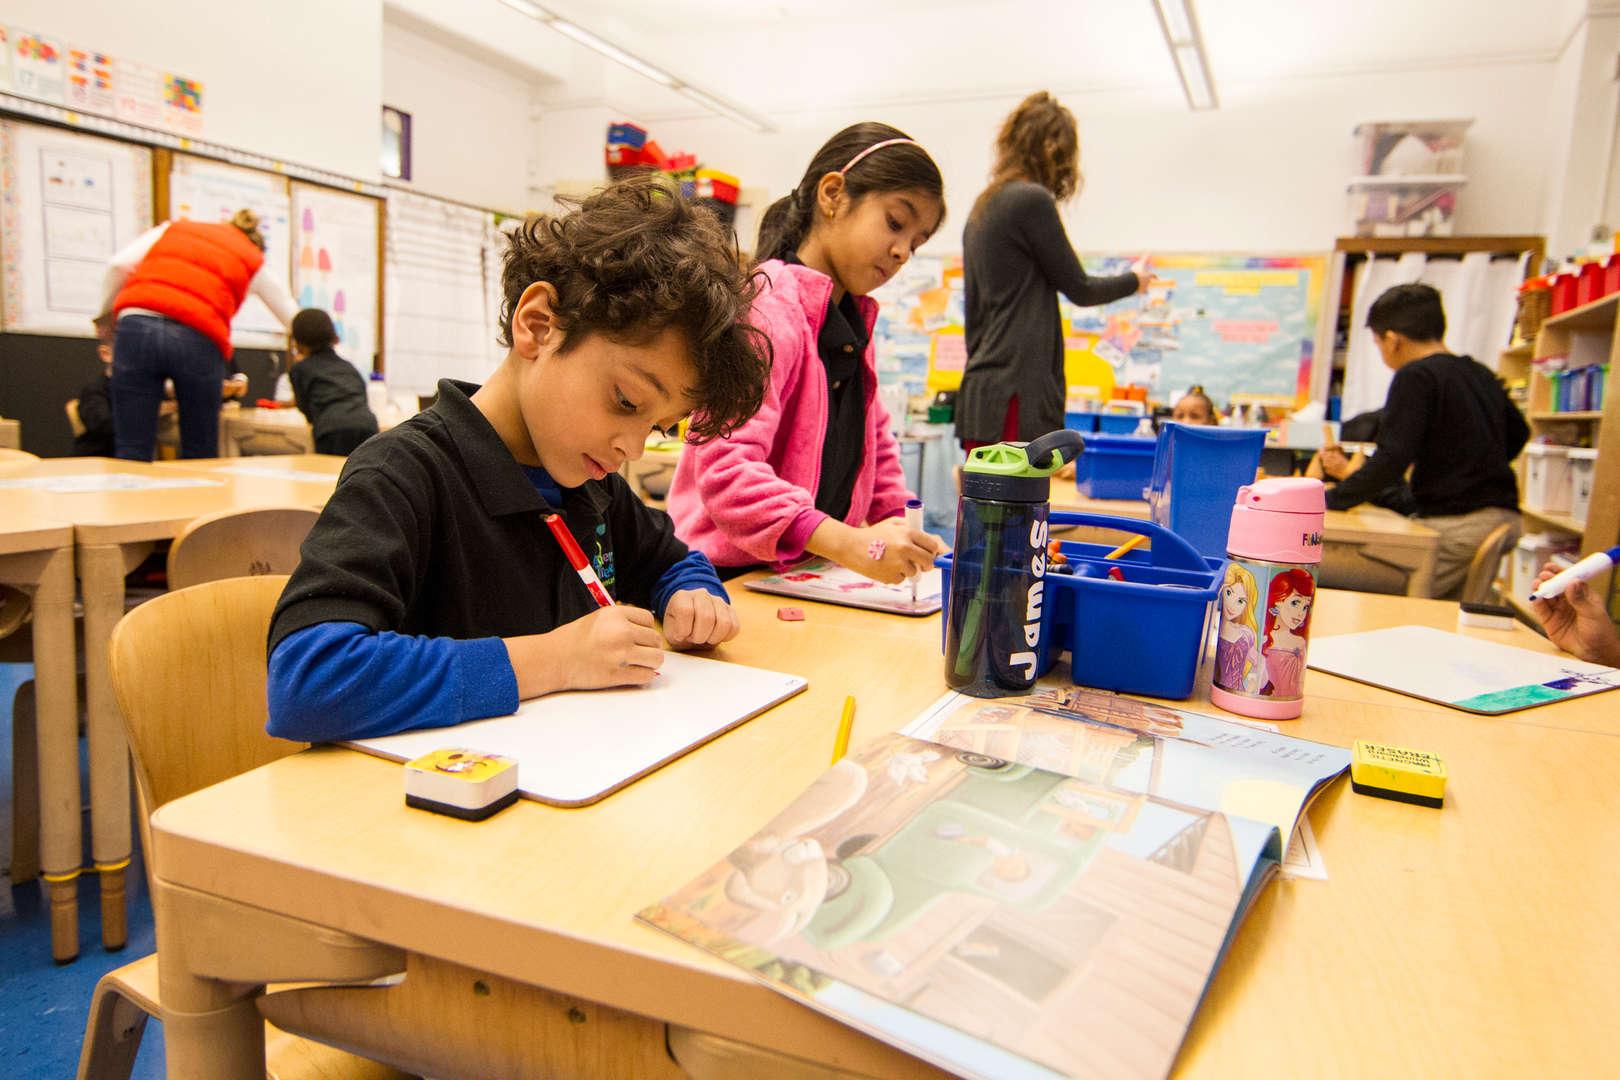 Kids using dry erase boards